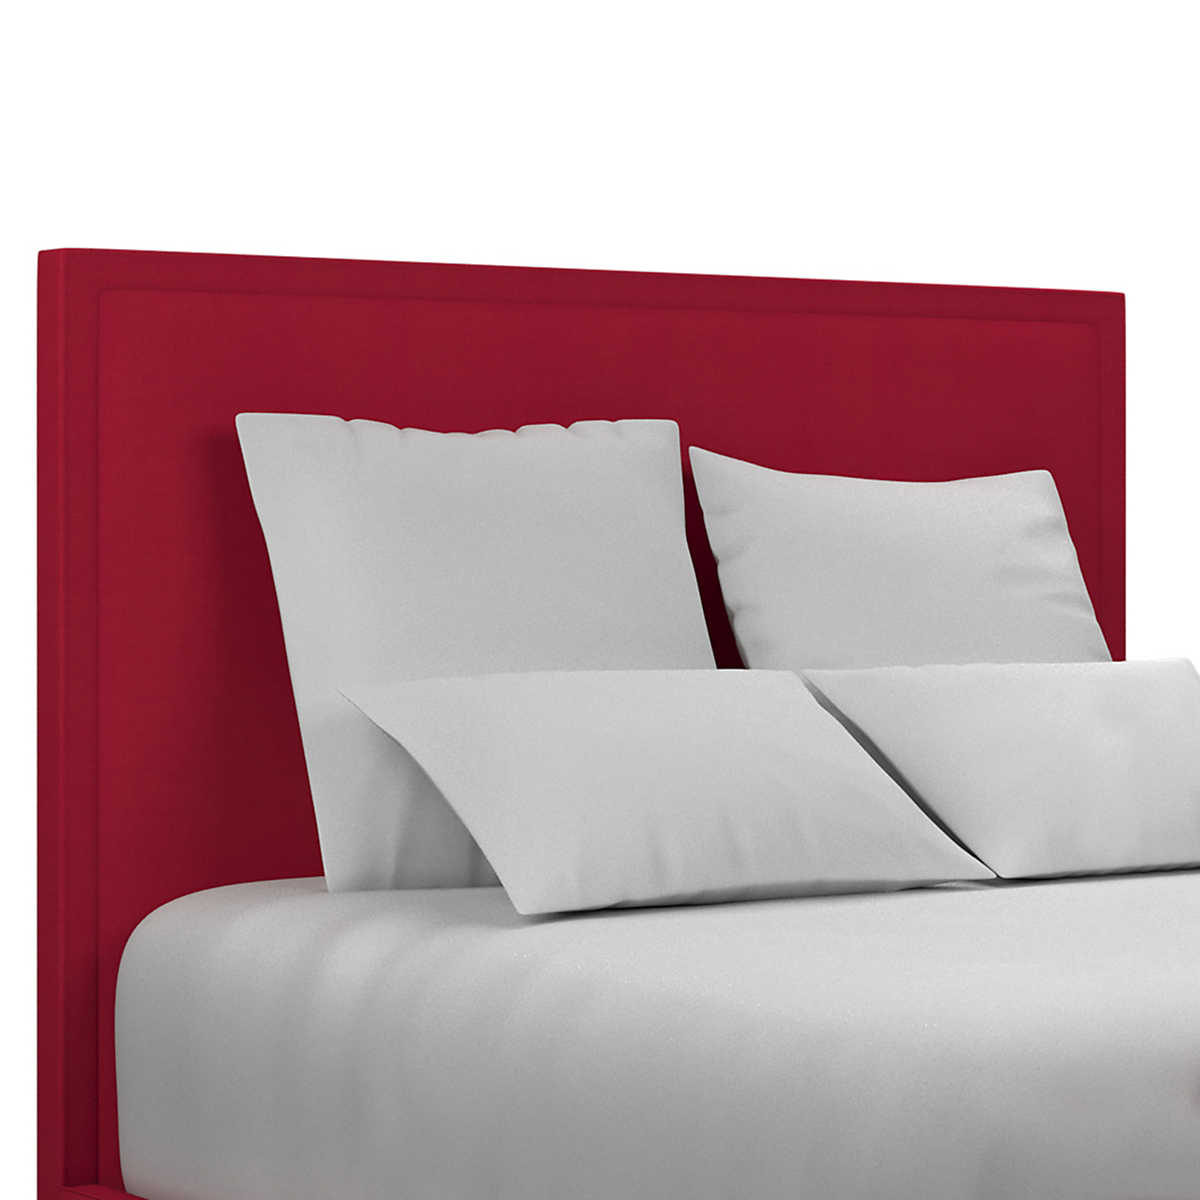 Estate Linen Red Colebrook Smoke Headboard | Furniture